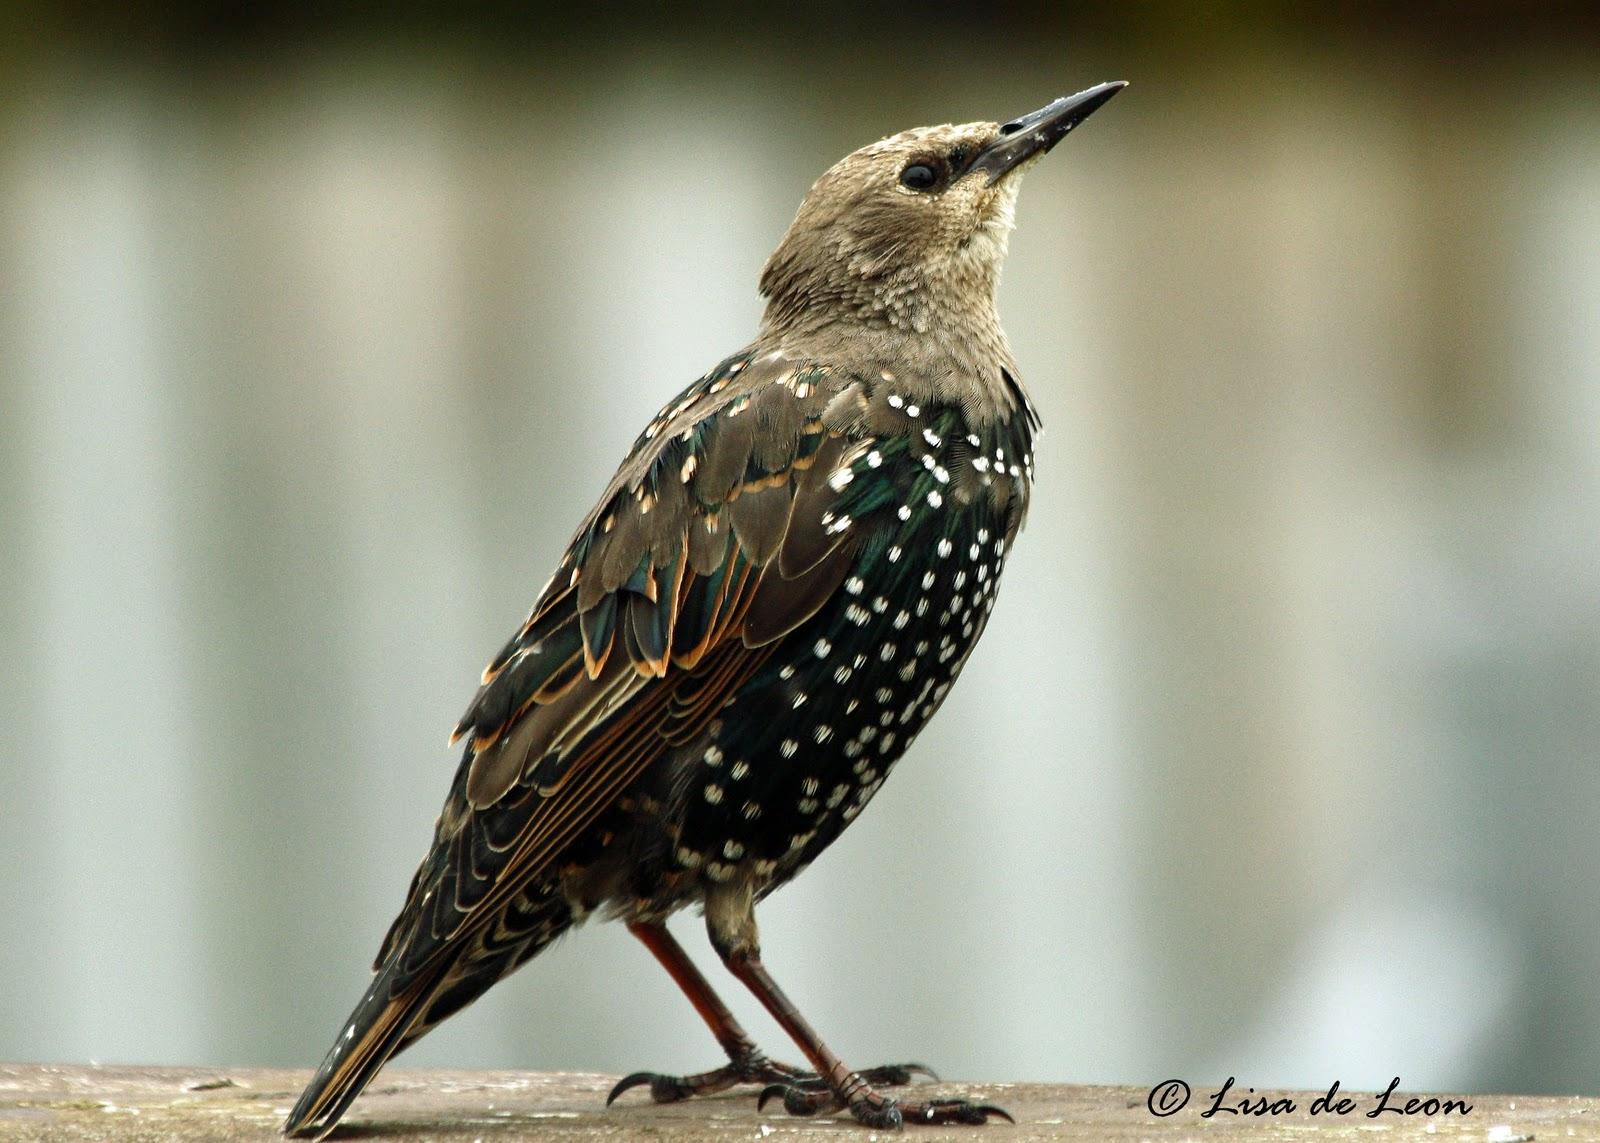 Birding with Lisa de Leon: European Starling